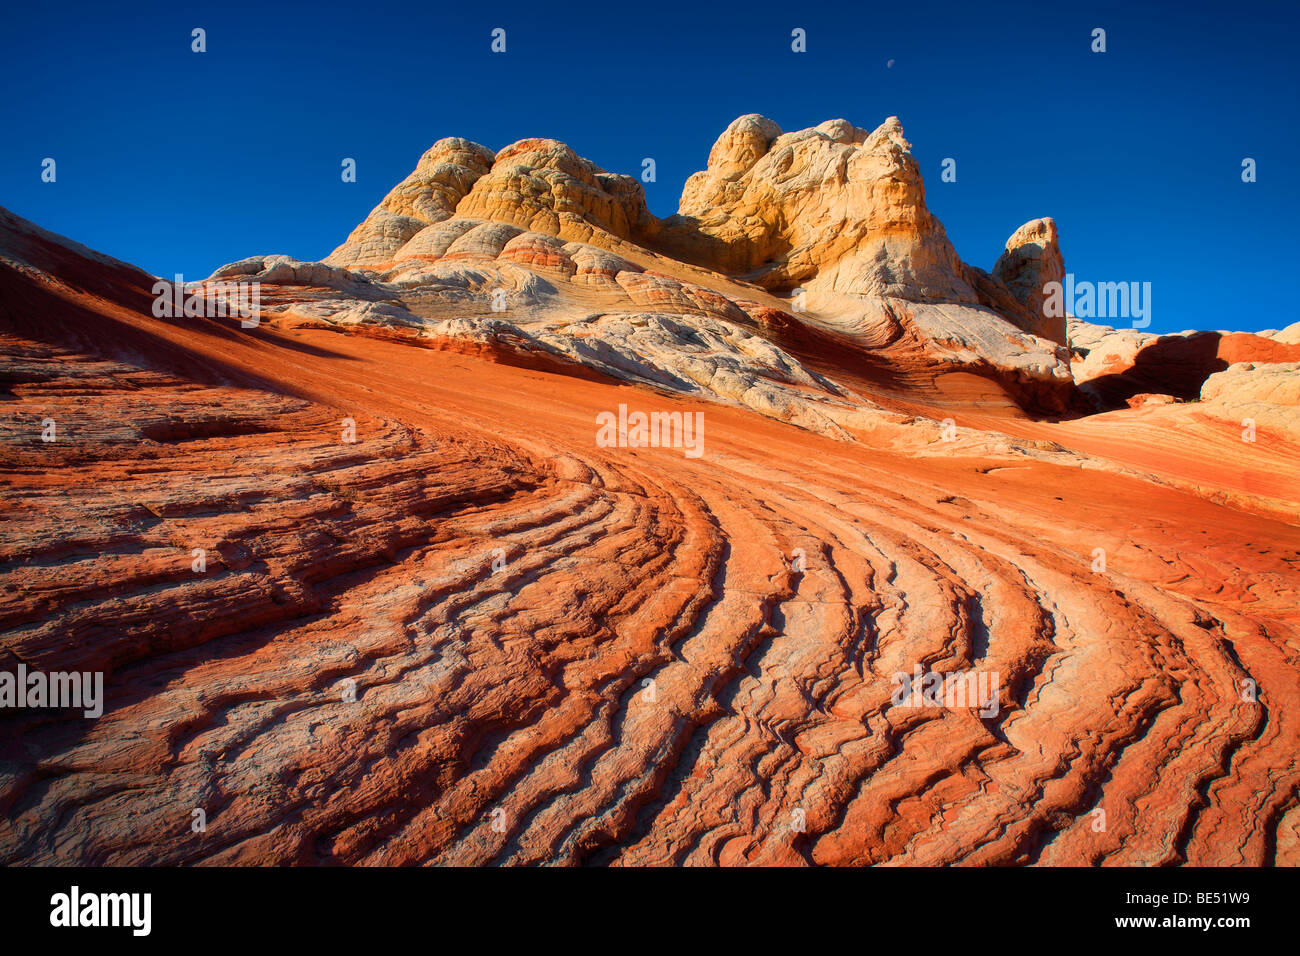 Sandstone ridges at White Pocket in Vermilion Cliffs National Monument, Arizona - Stock Image